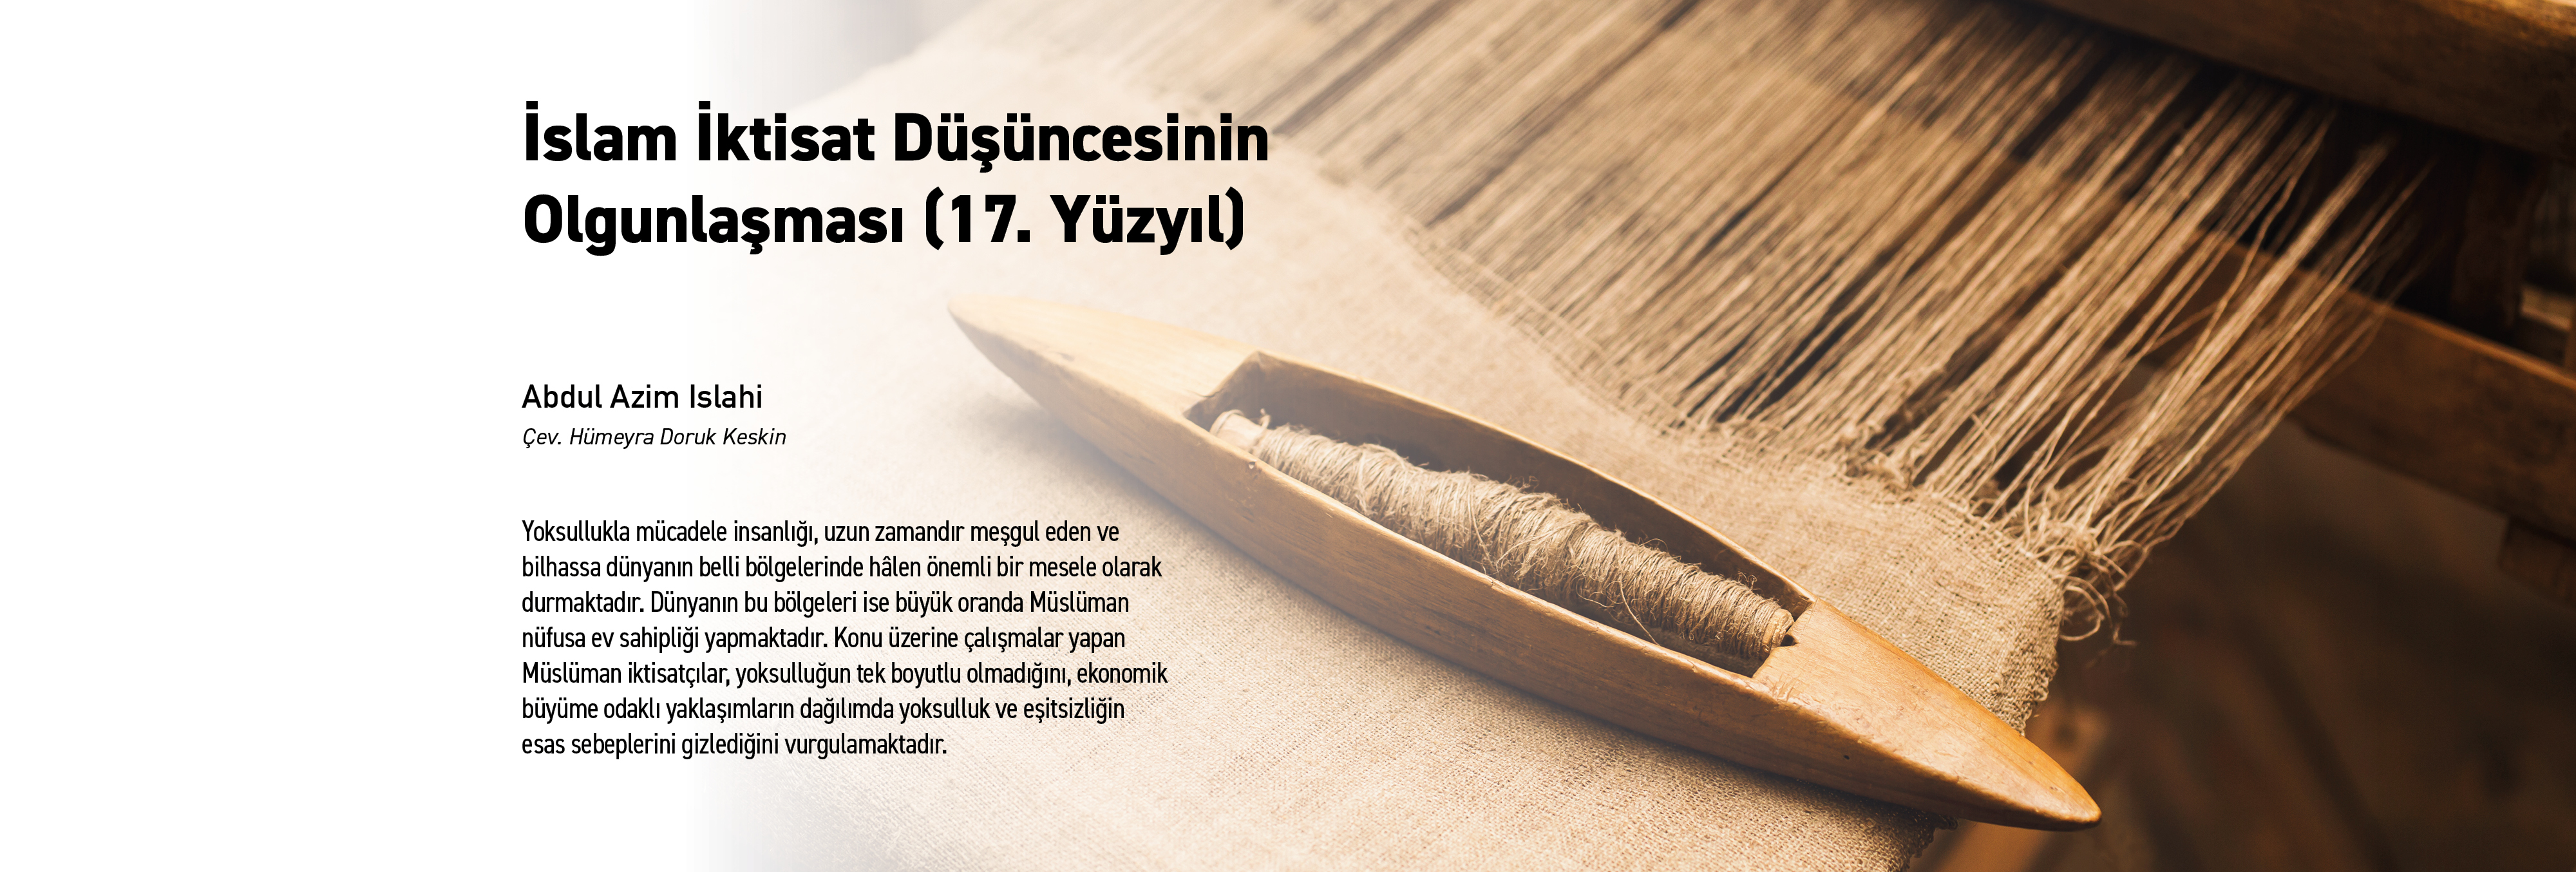 http://iktisatyayinlari.com/content/1-home/iktisaty_web_55.jpg